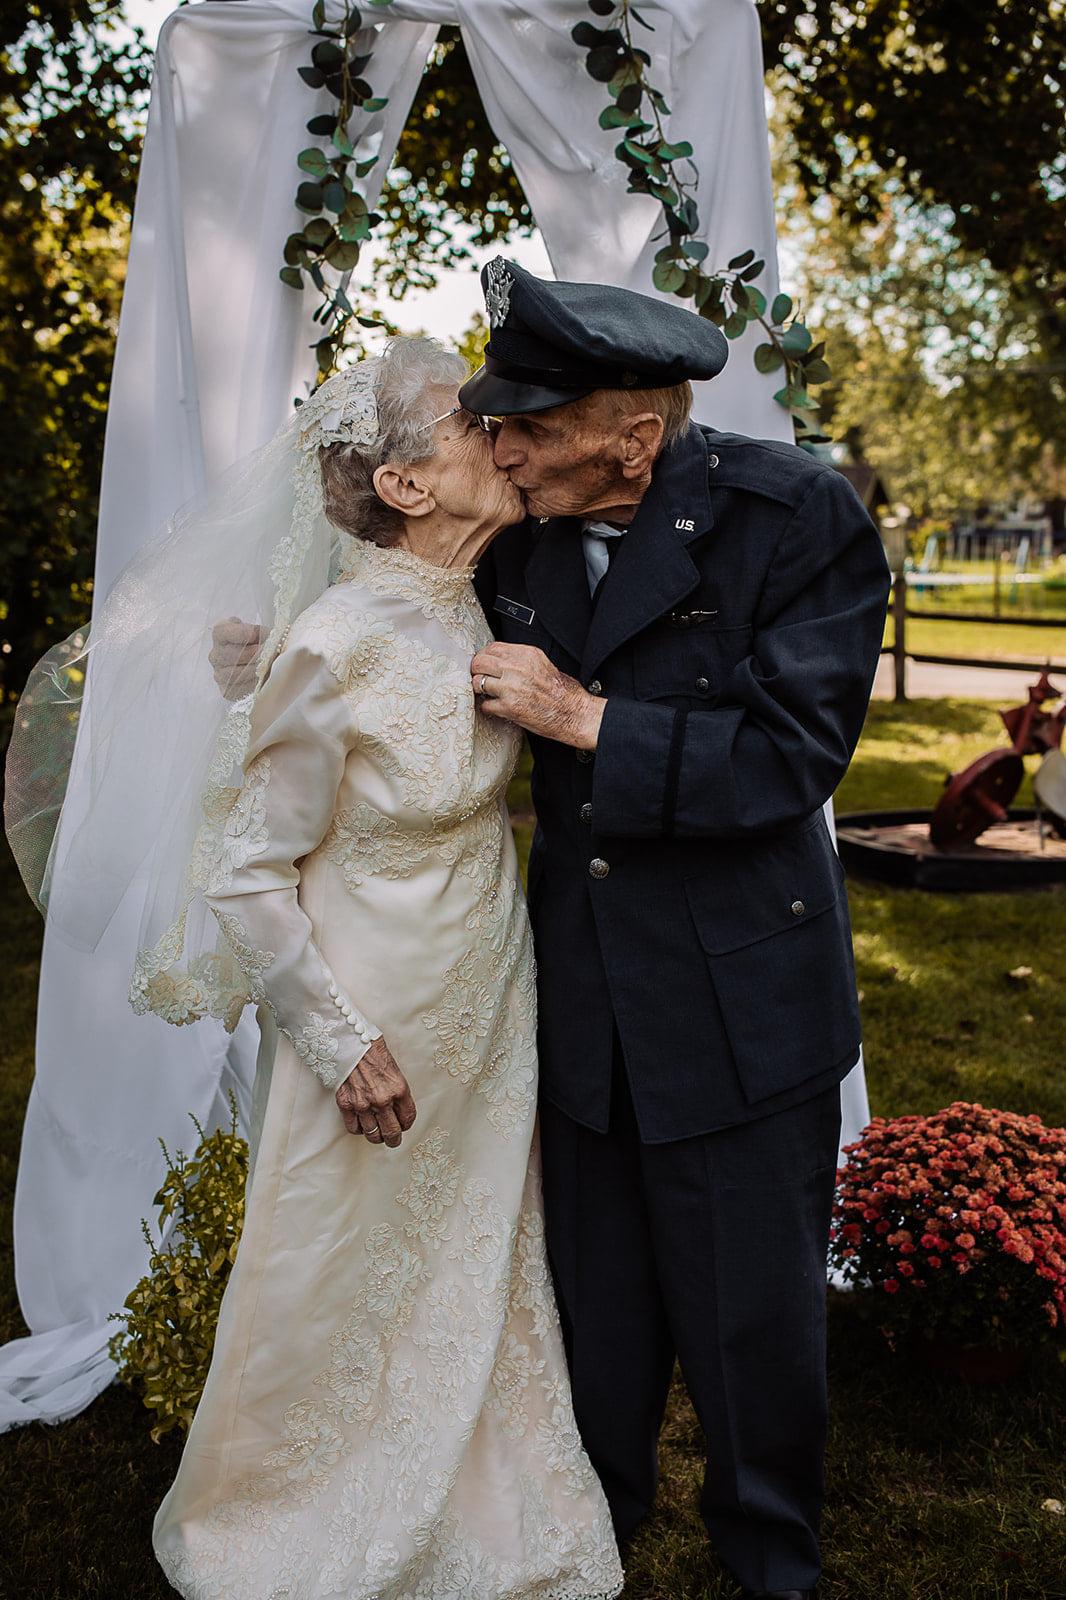 98 year old Couple finally make Wedding photos!